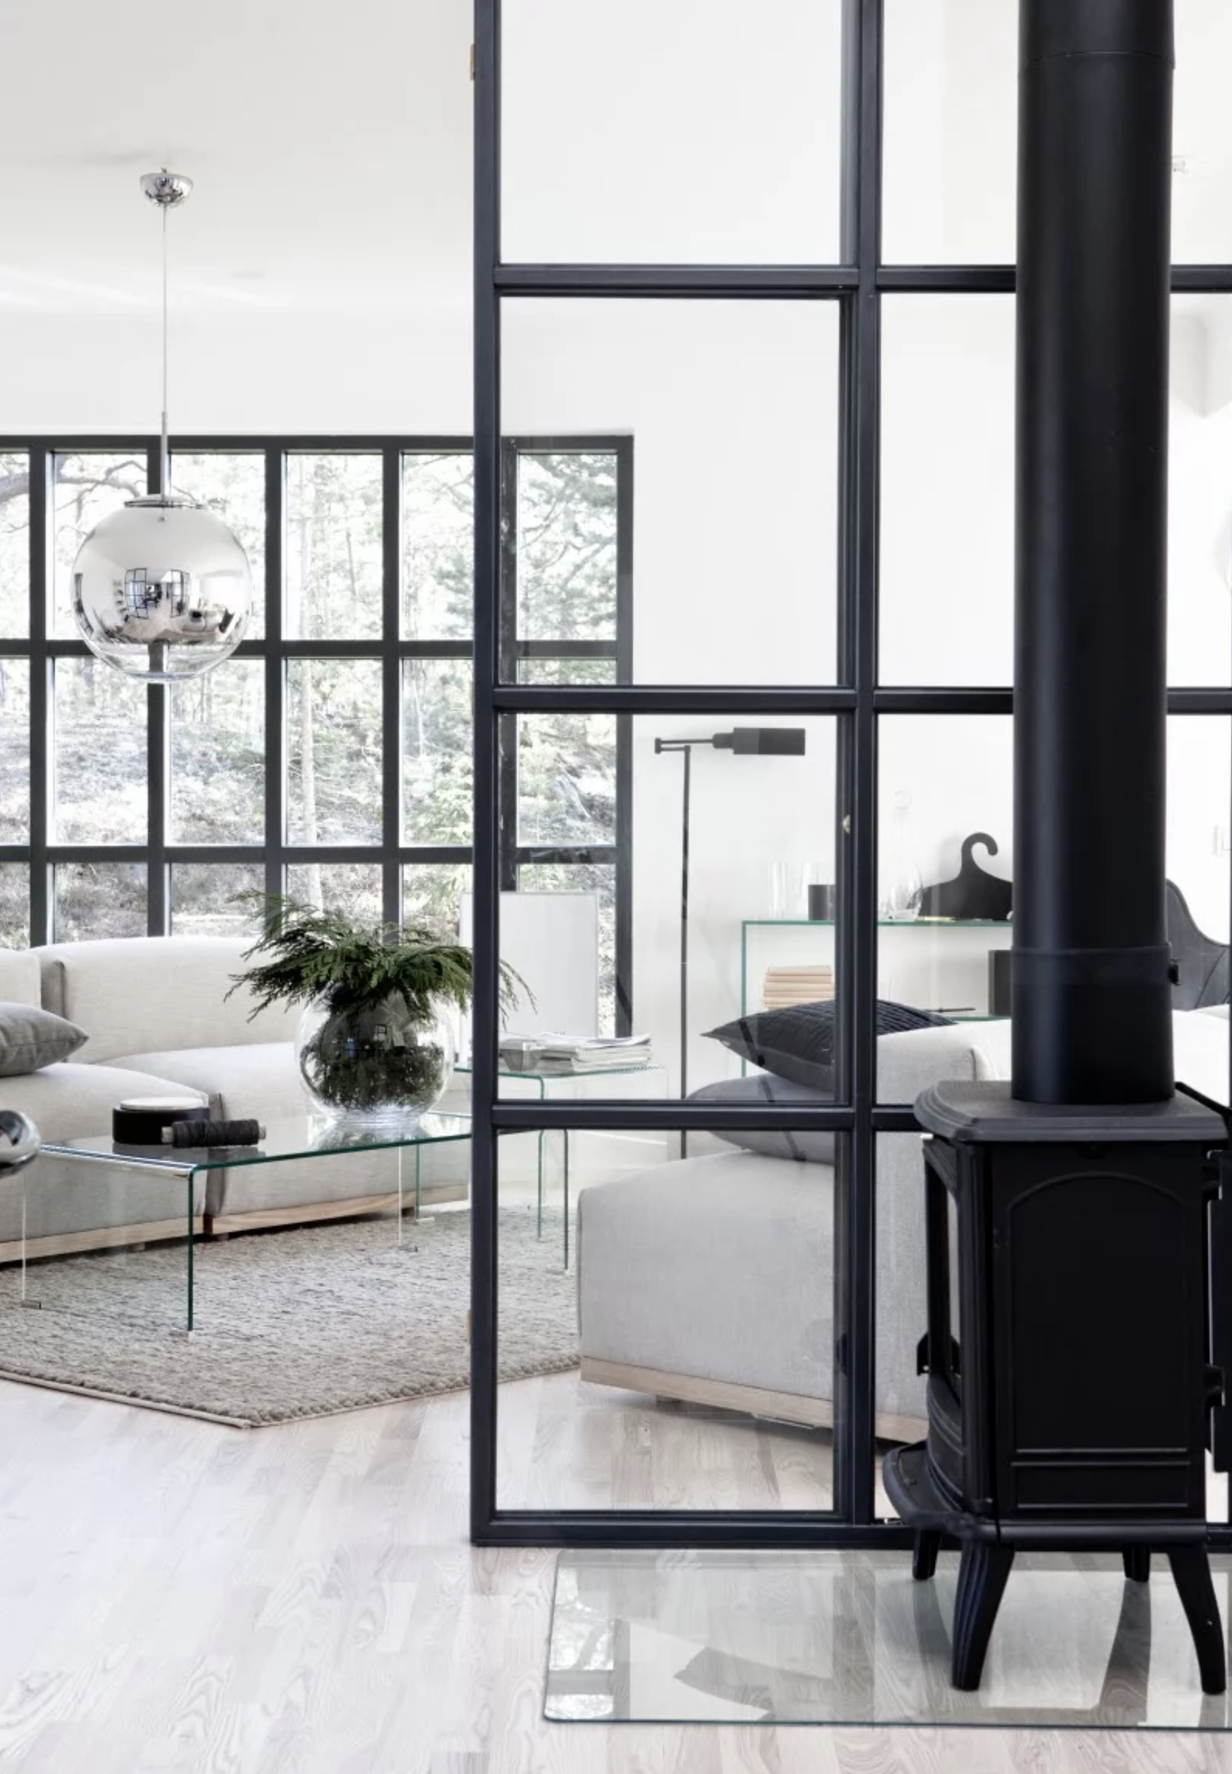 Swedish real estate site HusmanHagberg